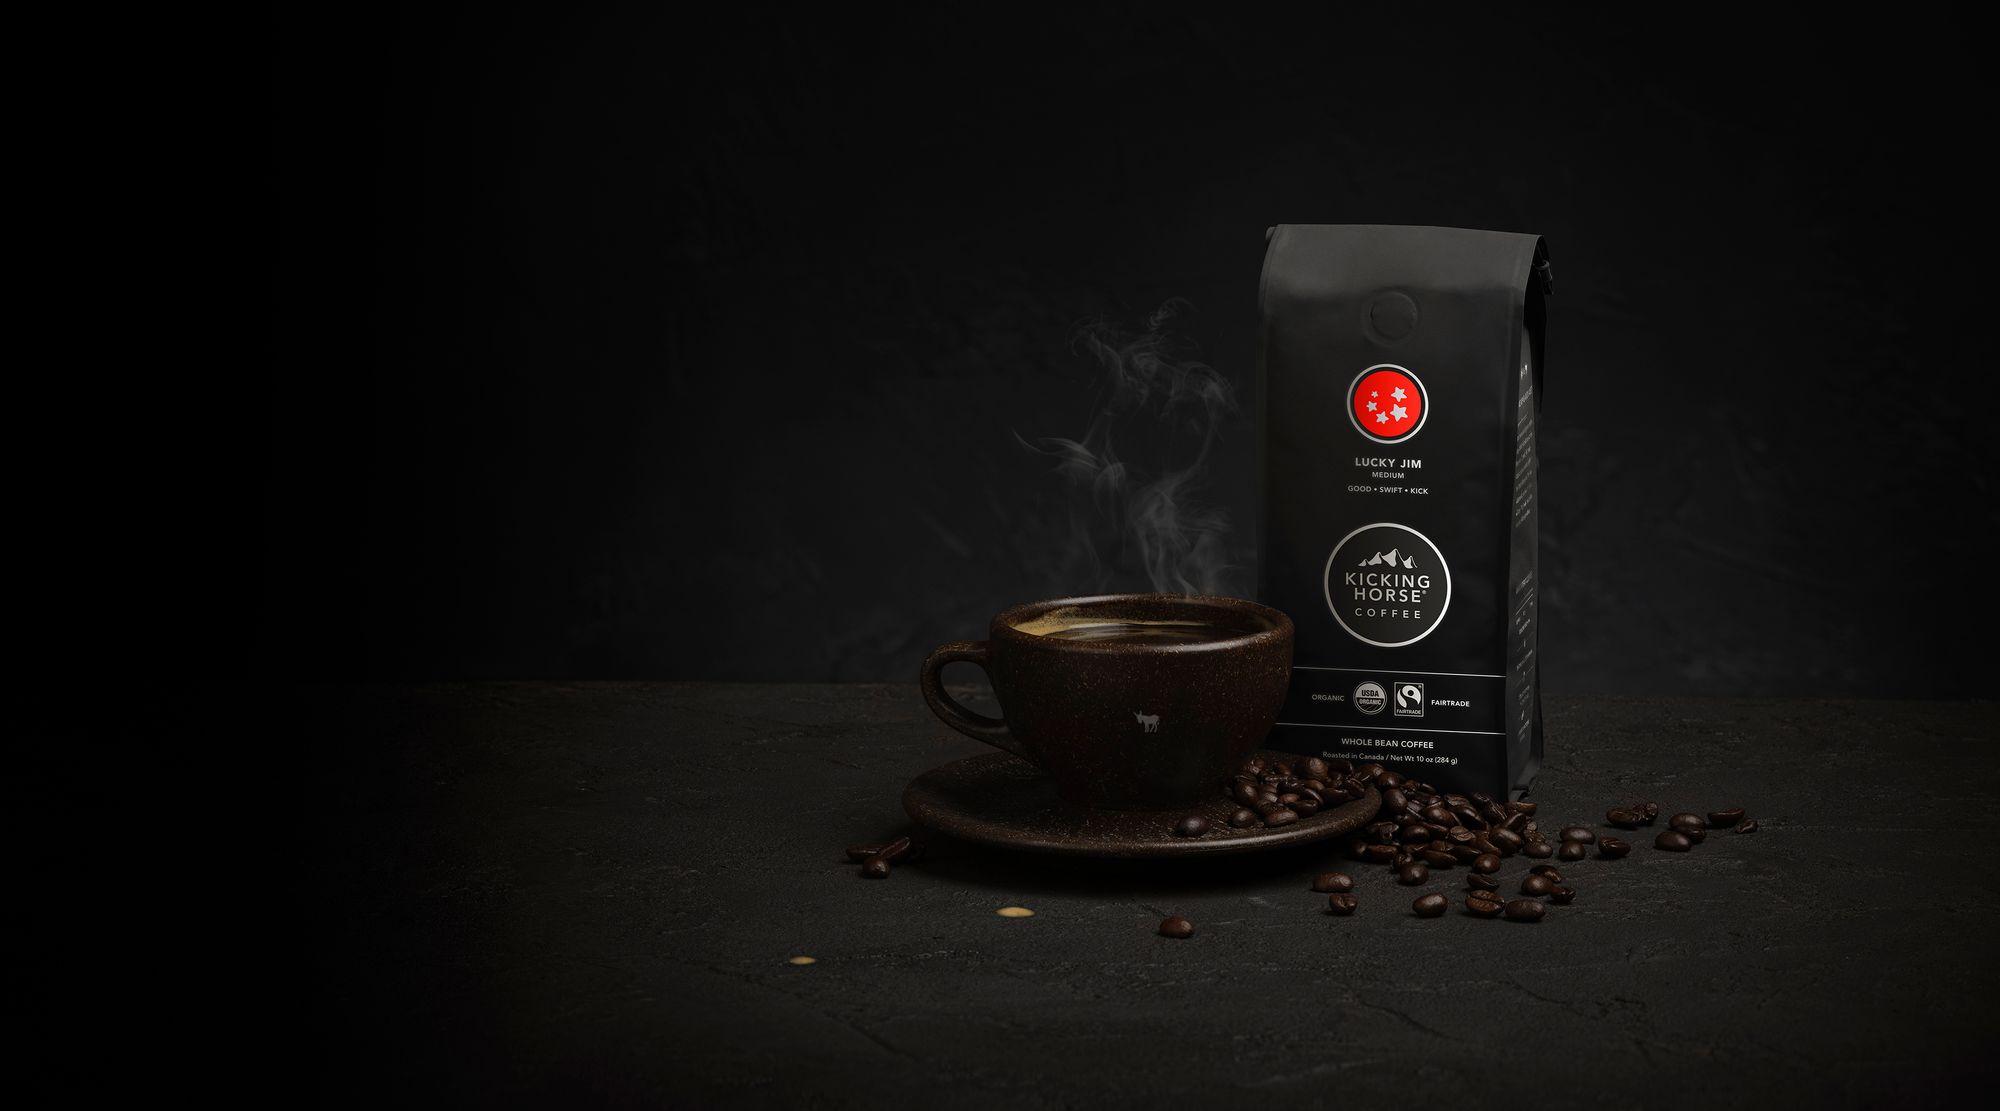 Lucky Jim whole bean and ground coffee with coffee mug